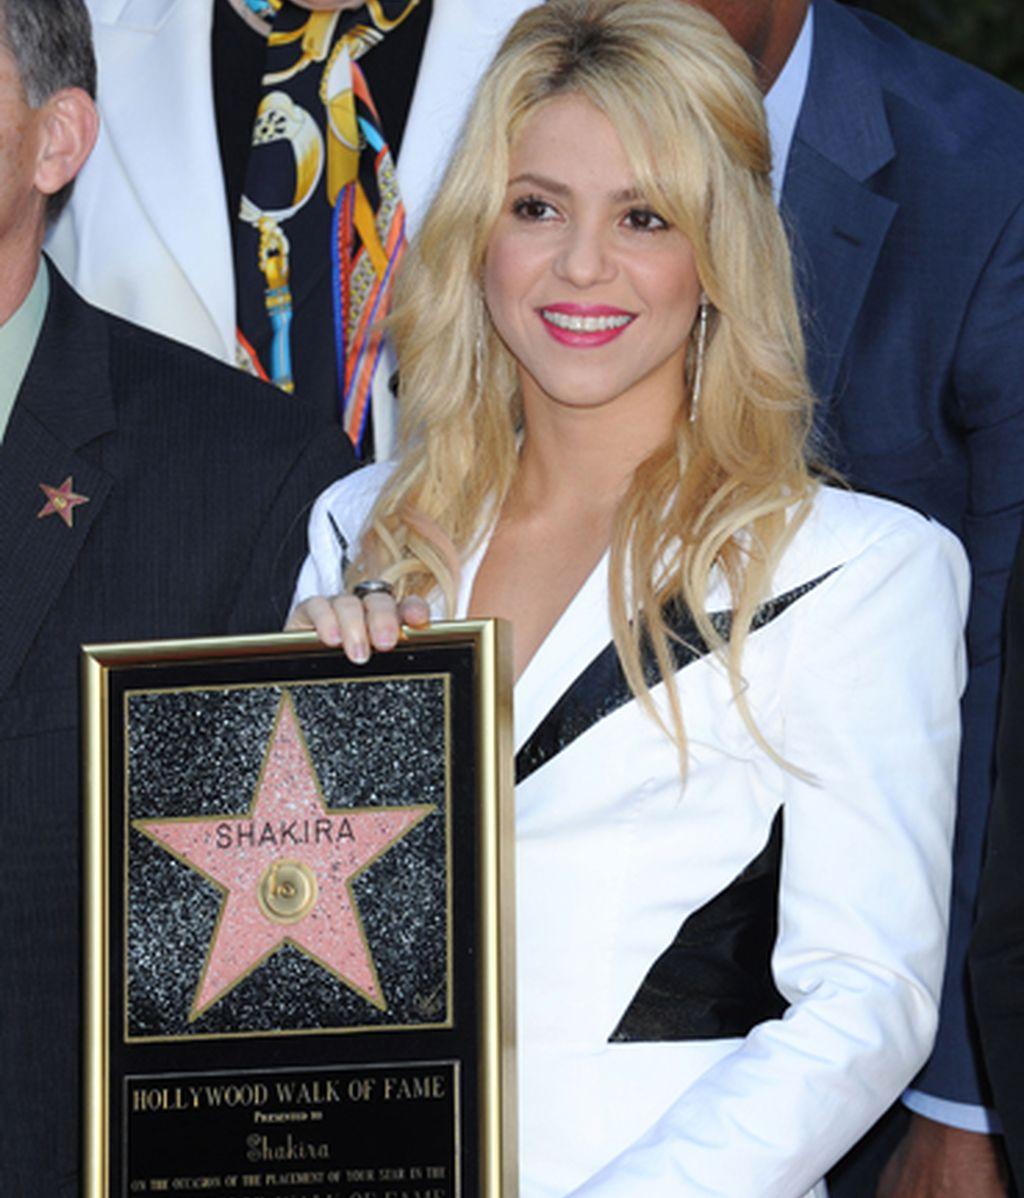 Shakira ya tiene estrella en el Paseo de la Fama